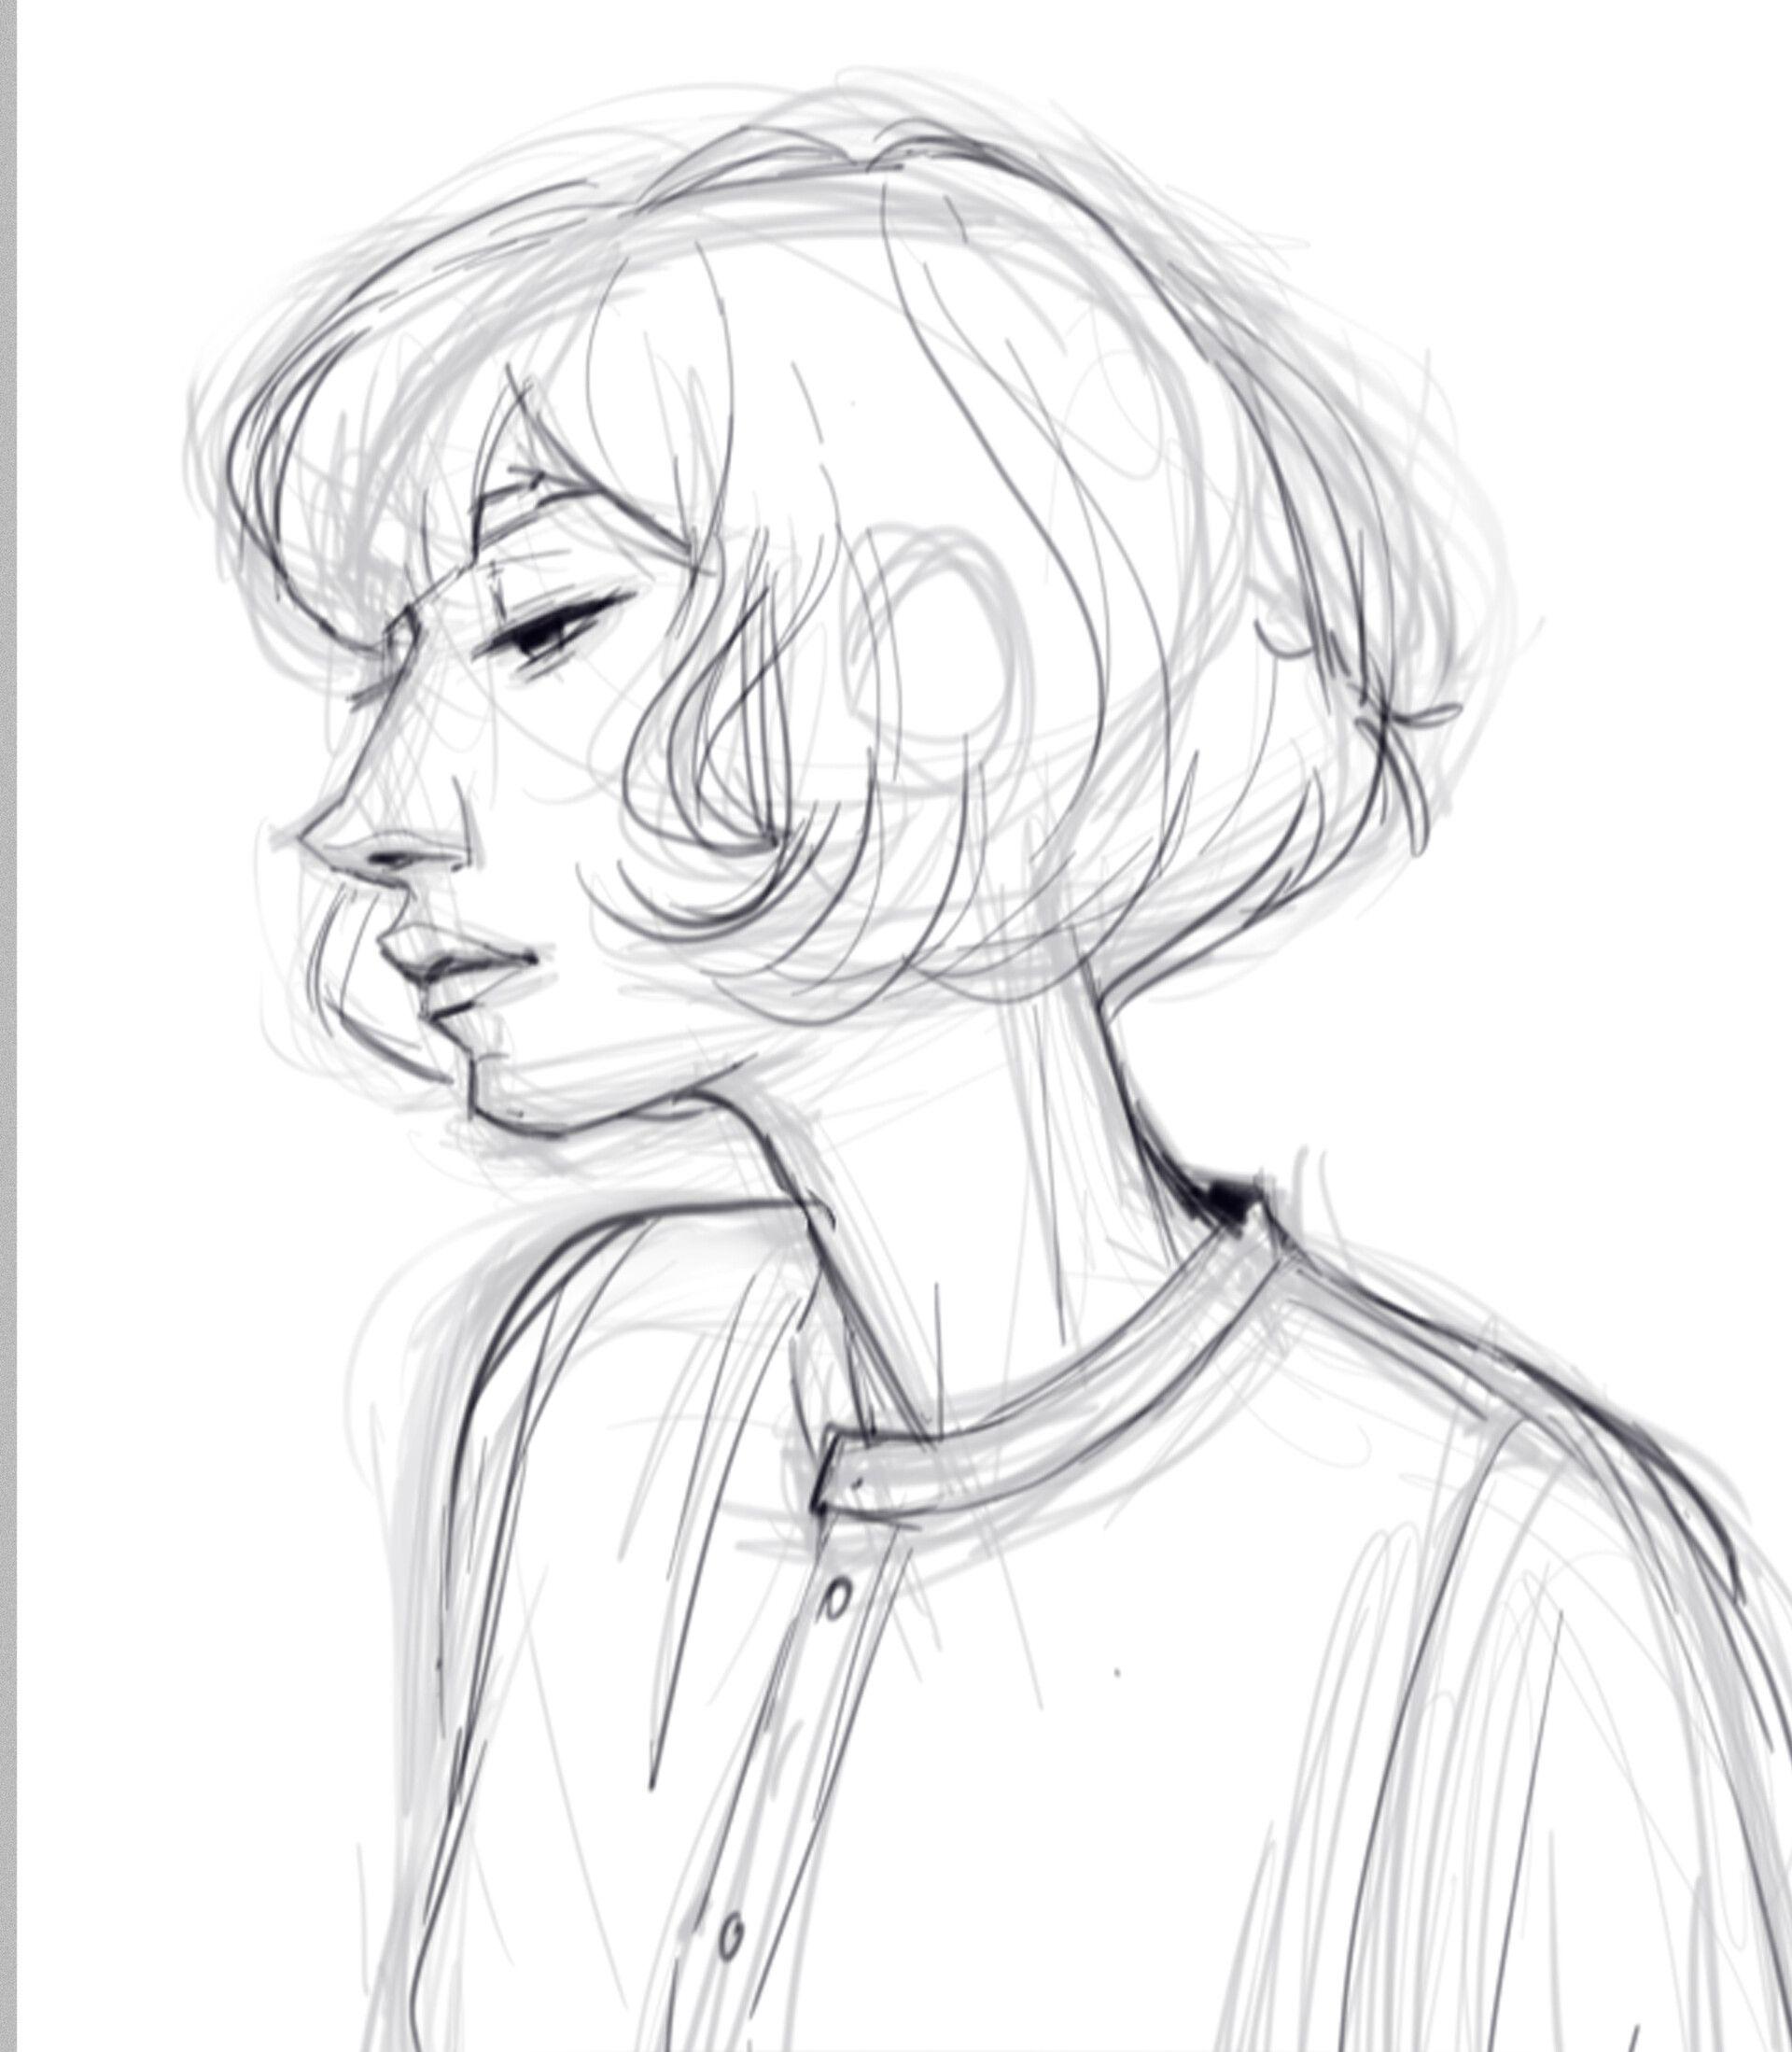 ArtStation StudyPeople_7, Meybis Ruiz Cruz Character